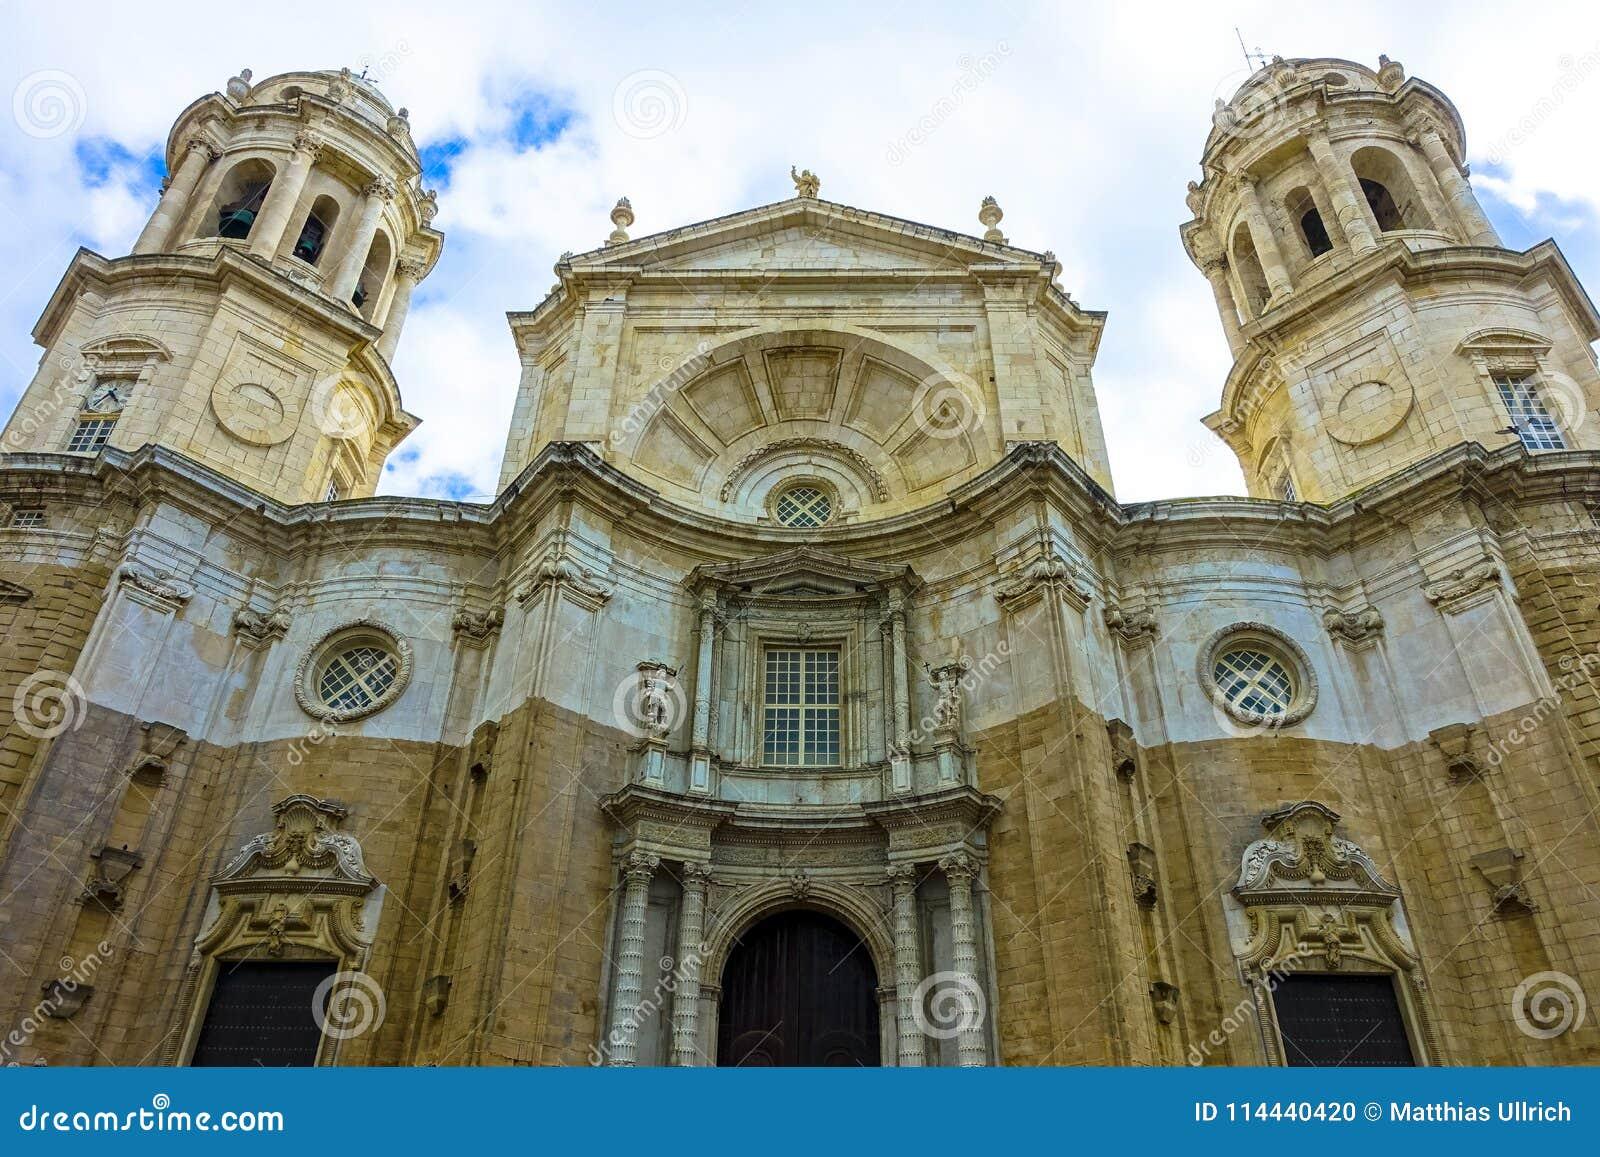 Cudowny widok katedralny De Santa Cruz w Cadiz, Hiszpania w Andalusia, obok dennego Campo Del Sura